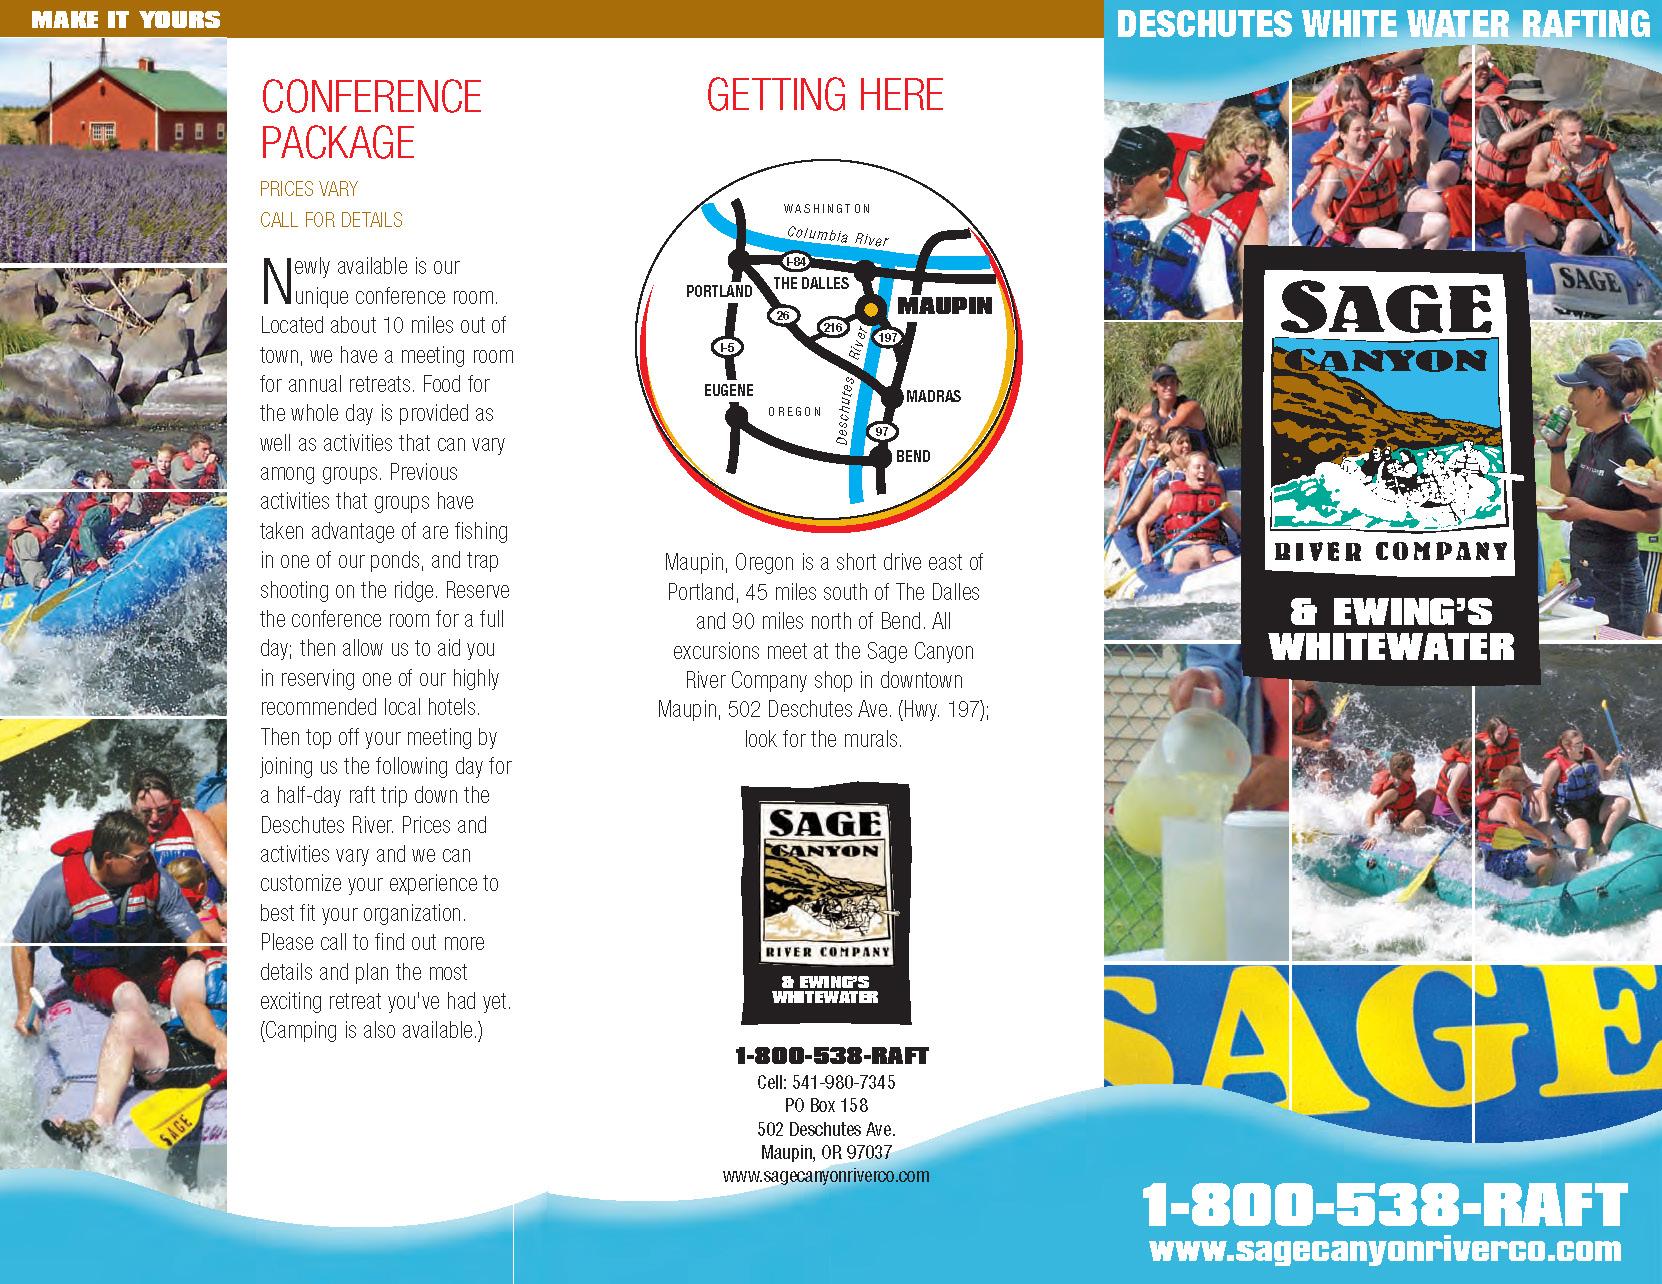 Sage Canyon Brochure